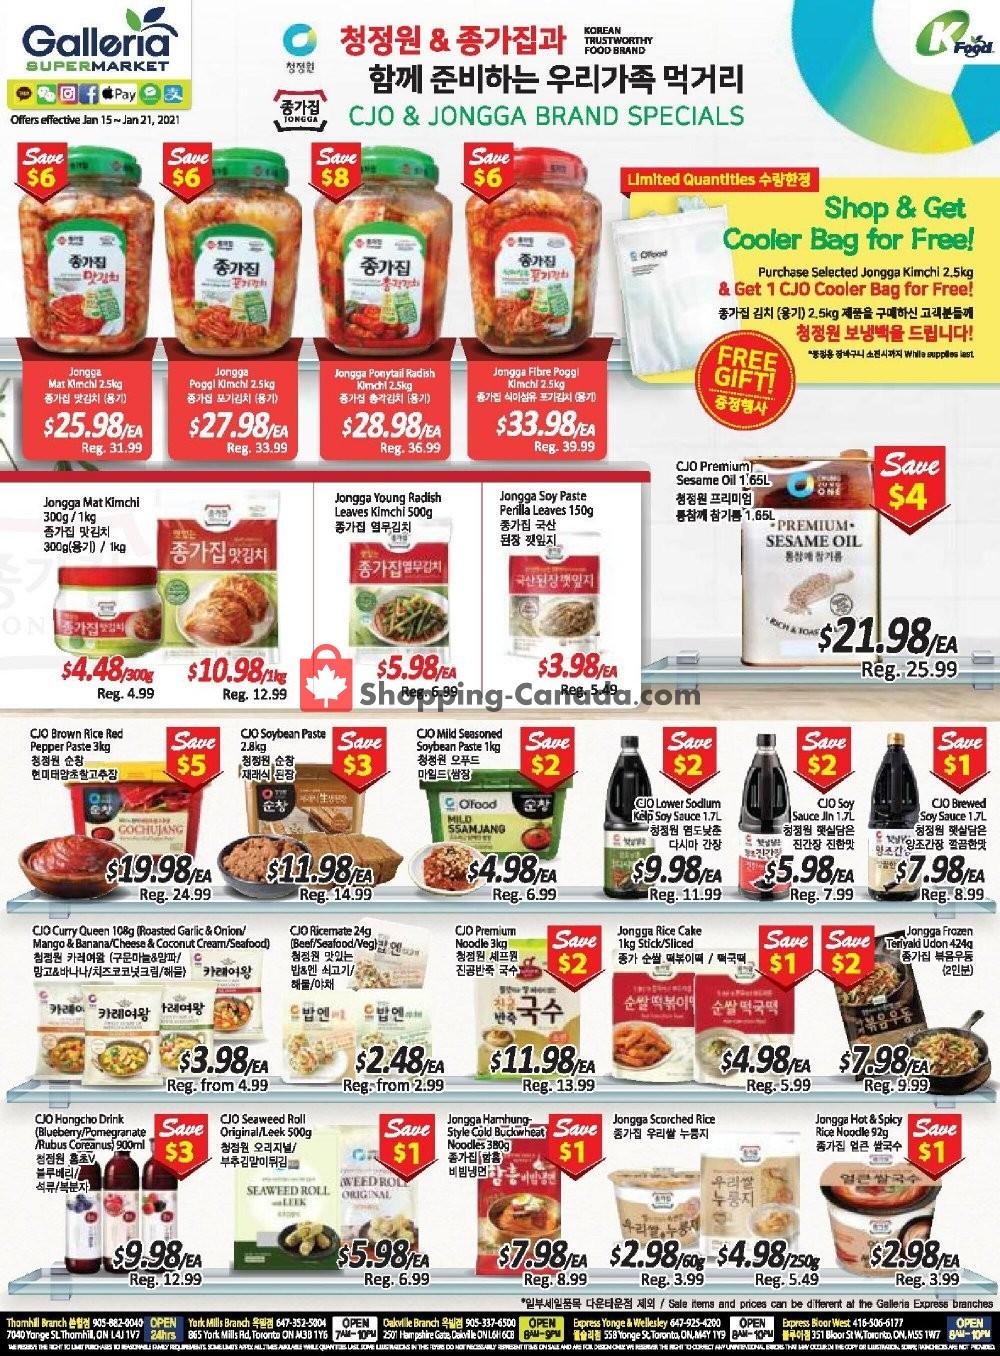 Flyer Galleria Supermarket Canada - from Friday January 15, 2021 to Thursday January 21, 2021